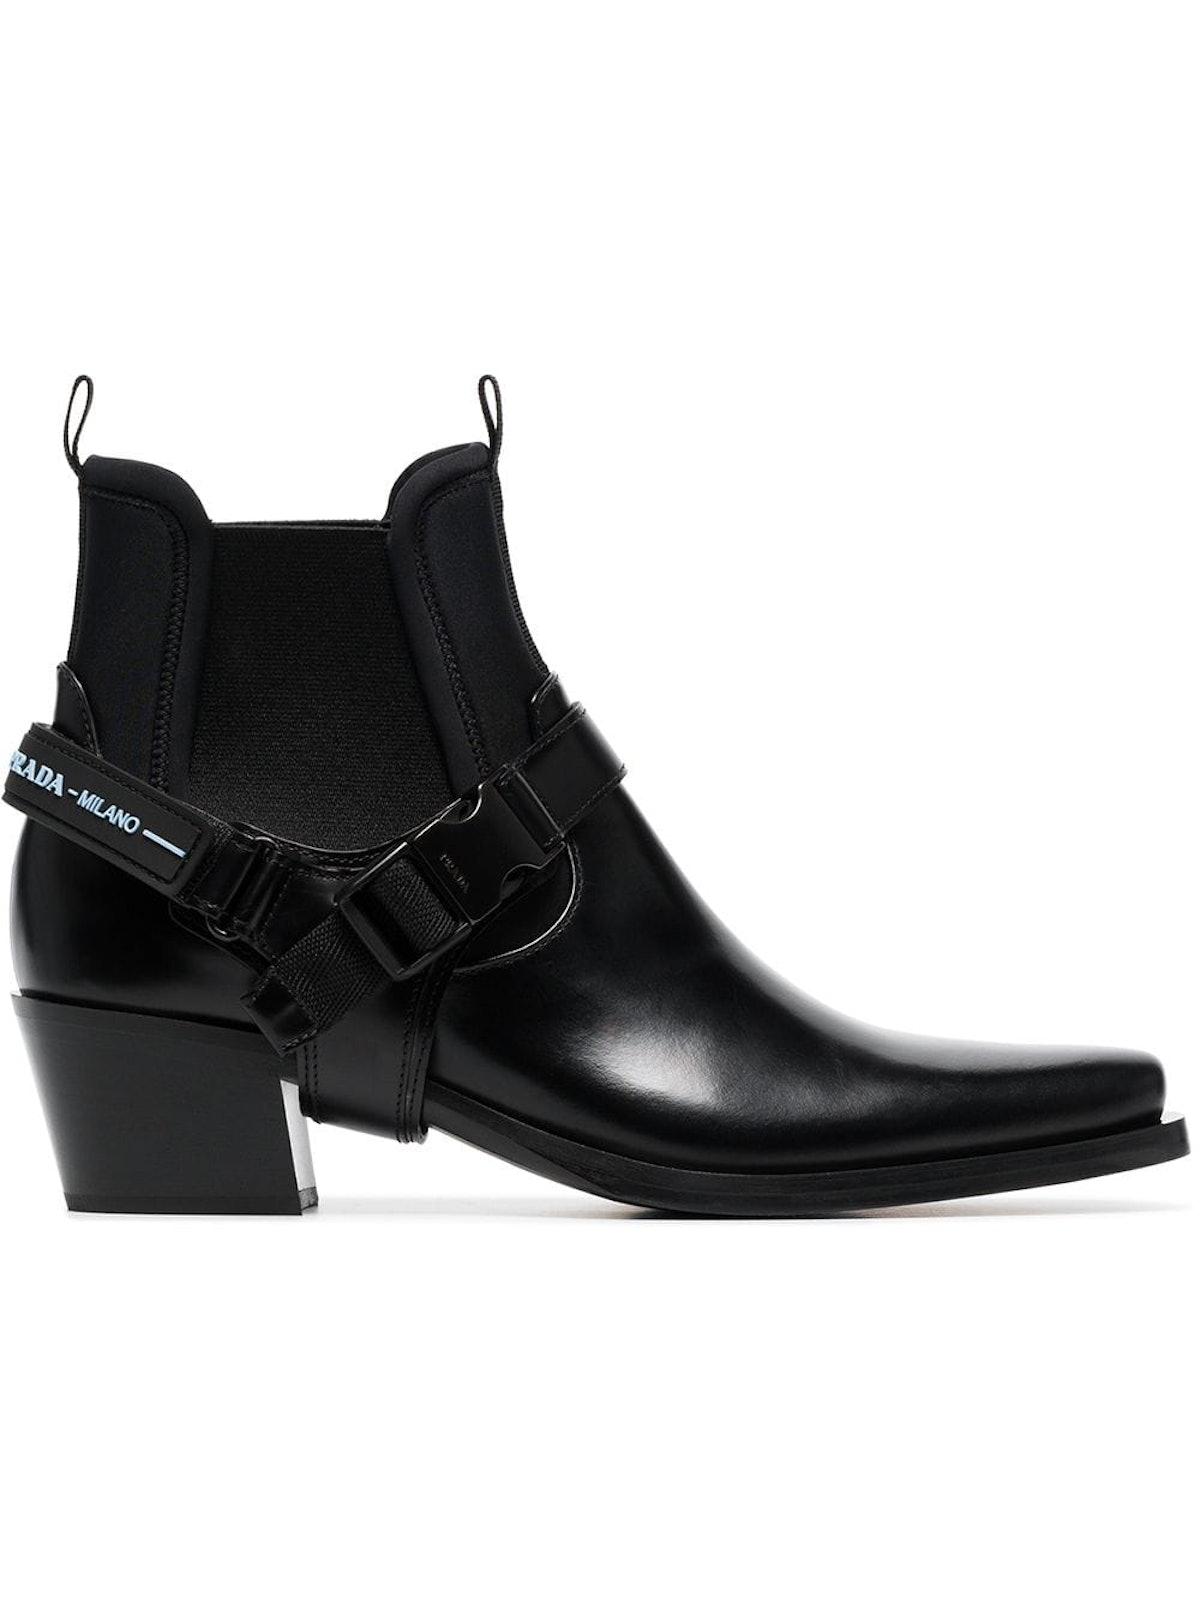 Black 50 Leather Cowboy Boots